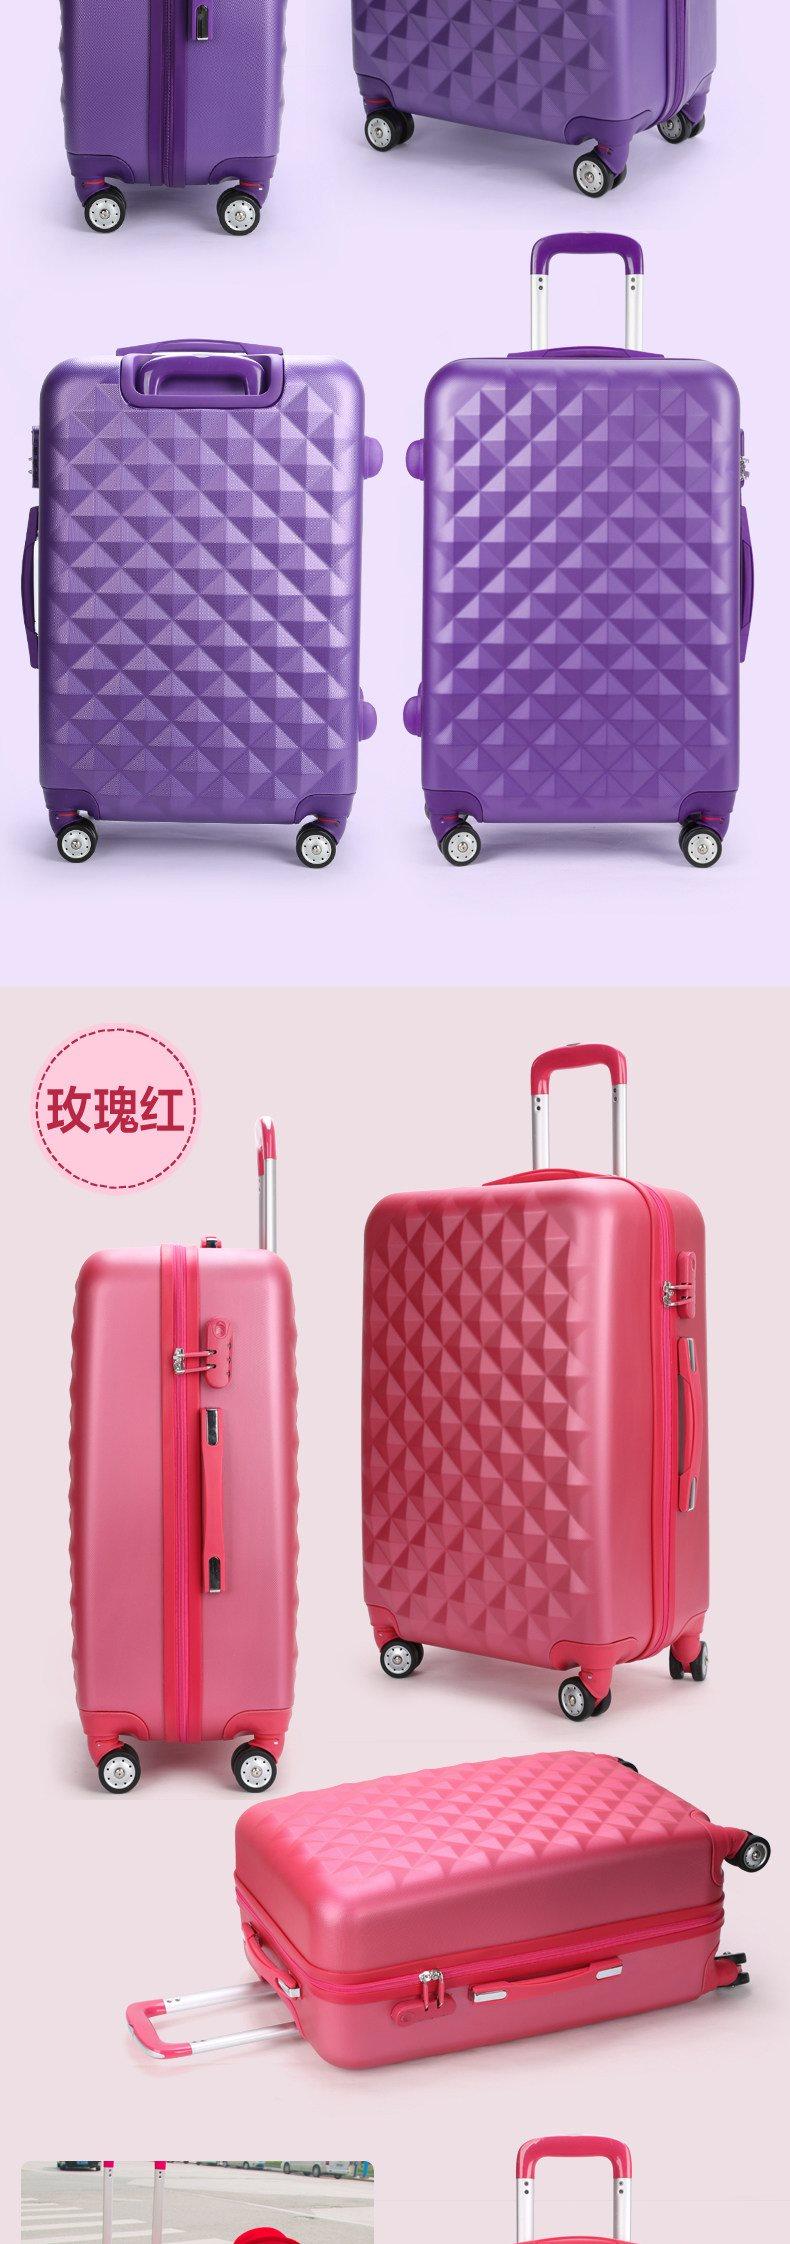 Luxury Luggage Hello Kitty Diamond Concept Suitcase